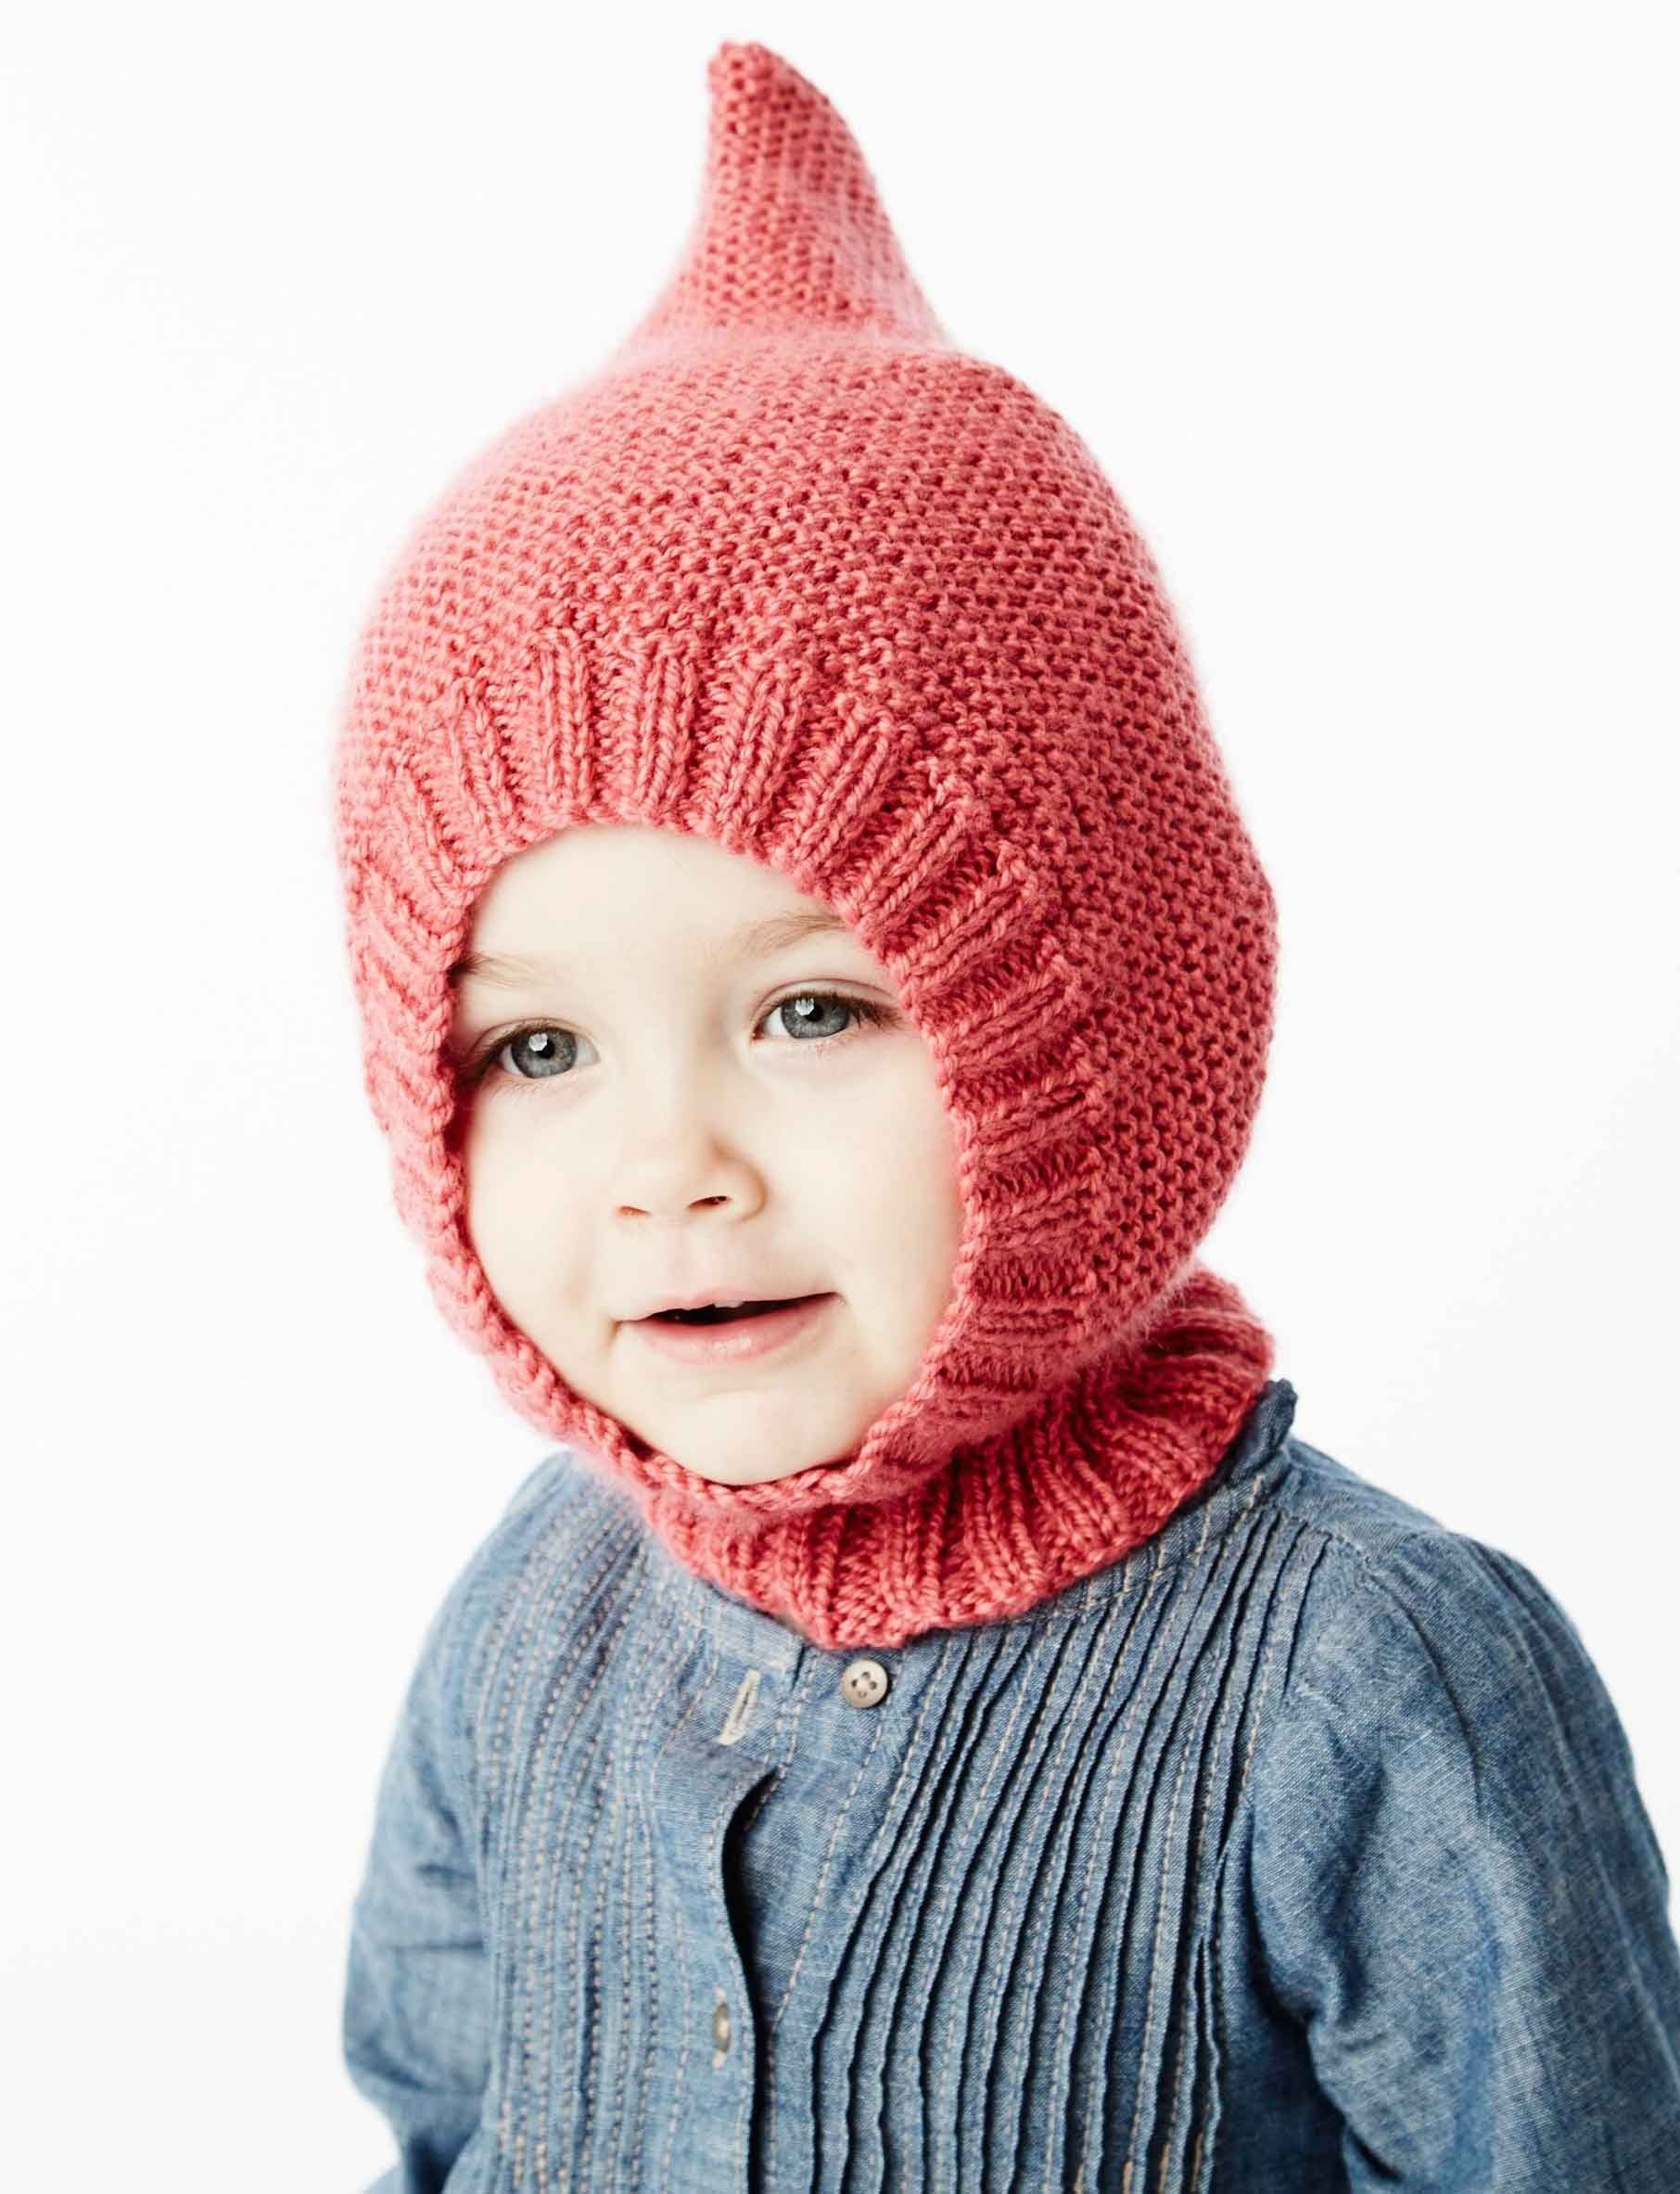 Yarnspirations.com - Bernat Little Gnome Hat - Patterns ... 35e2bf8e4be